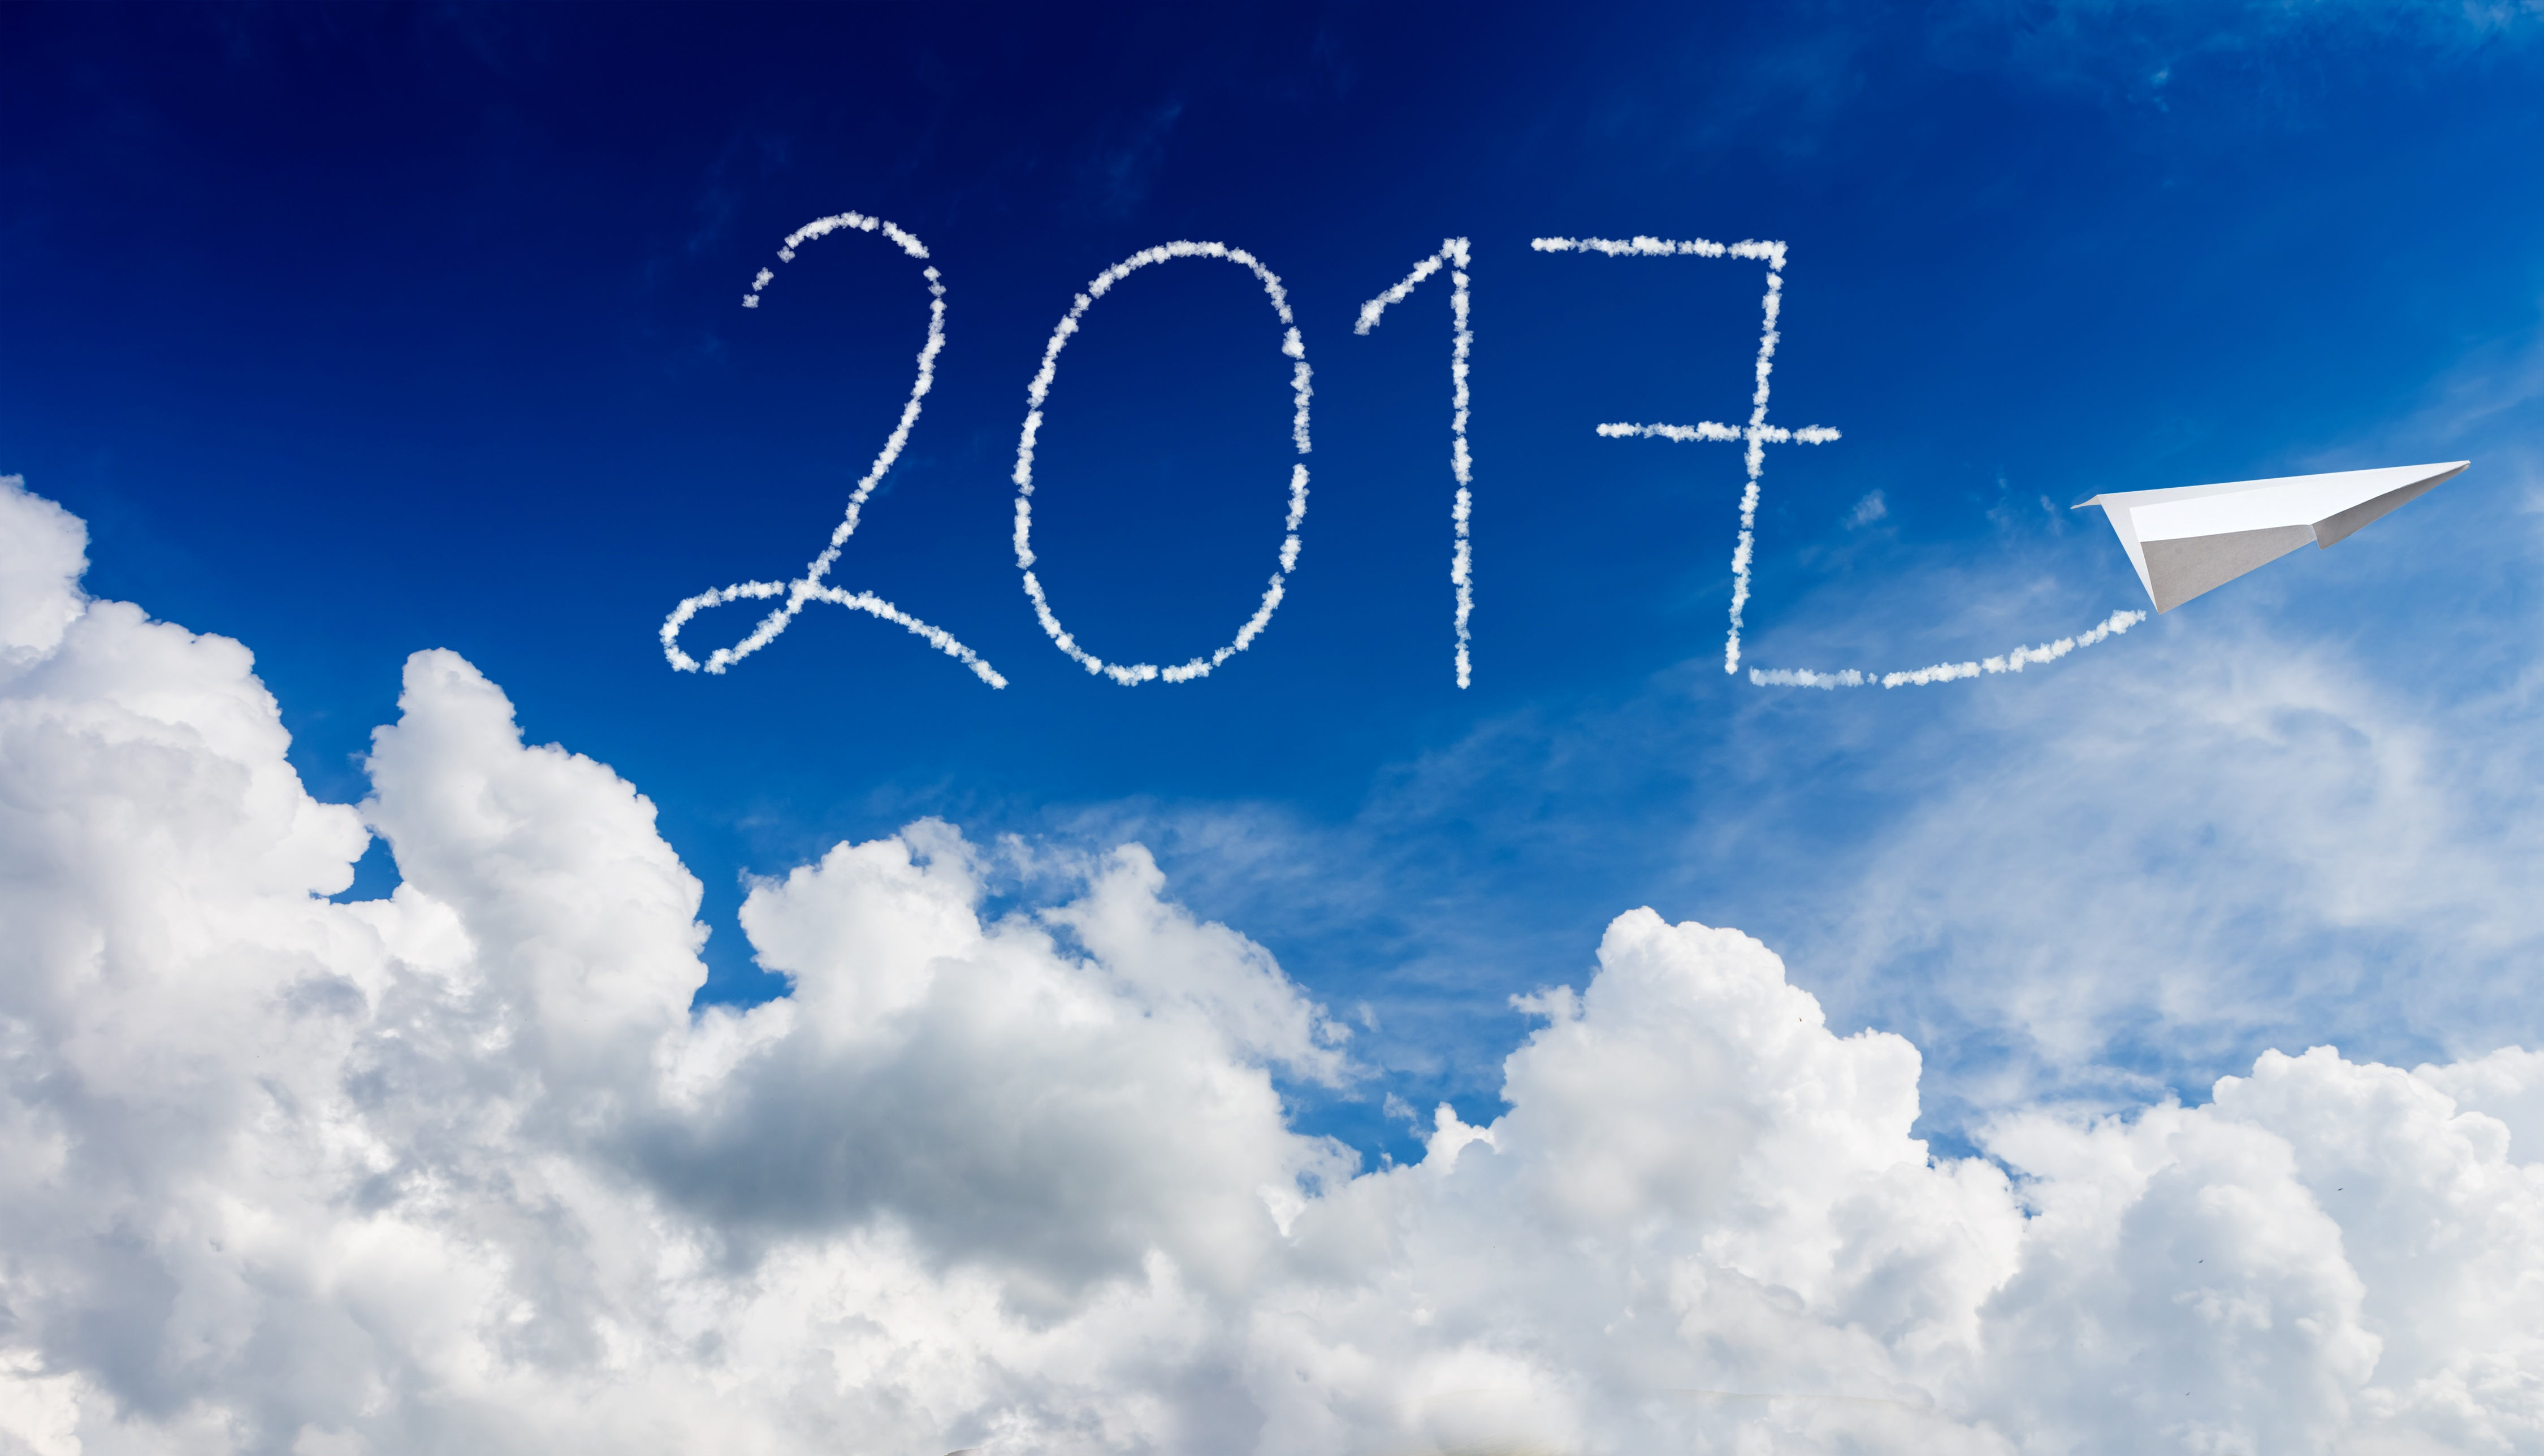 SS_Make_2017_Great_Sky_Clouds_FTA.jpg